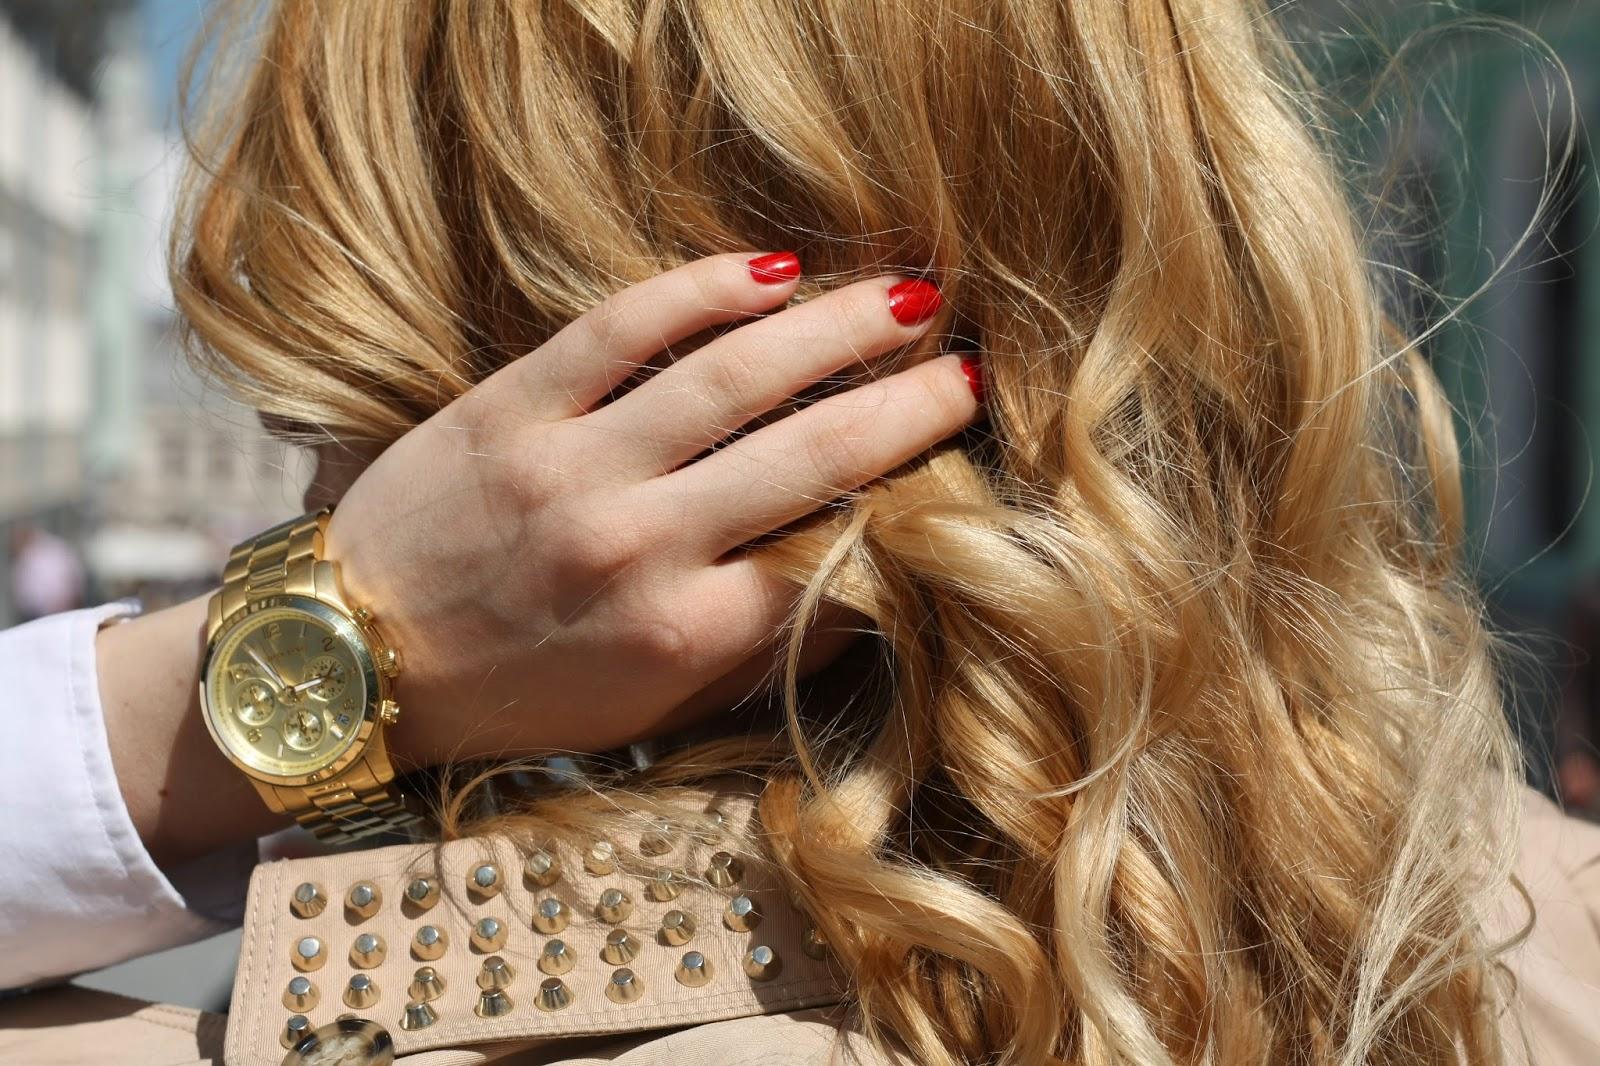 часы Michael Kors, Costa de la moda, Irina Pavlova, russian blogger